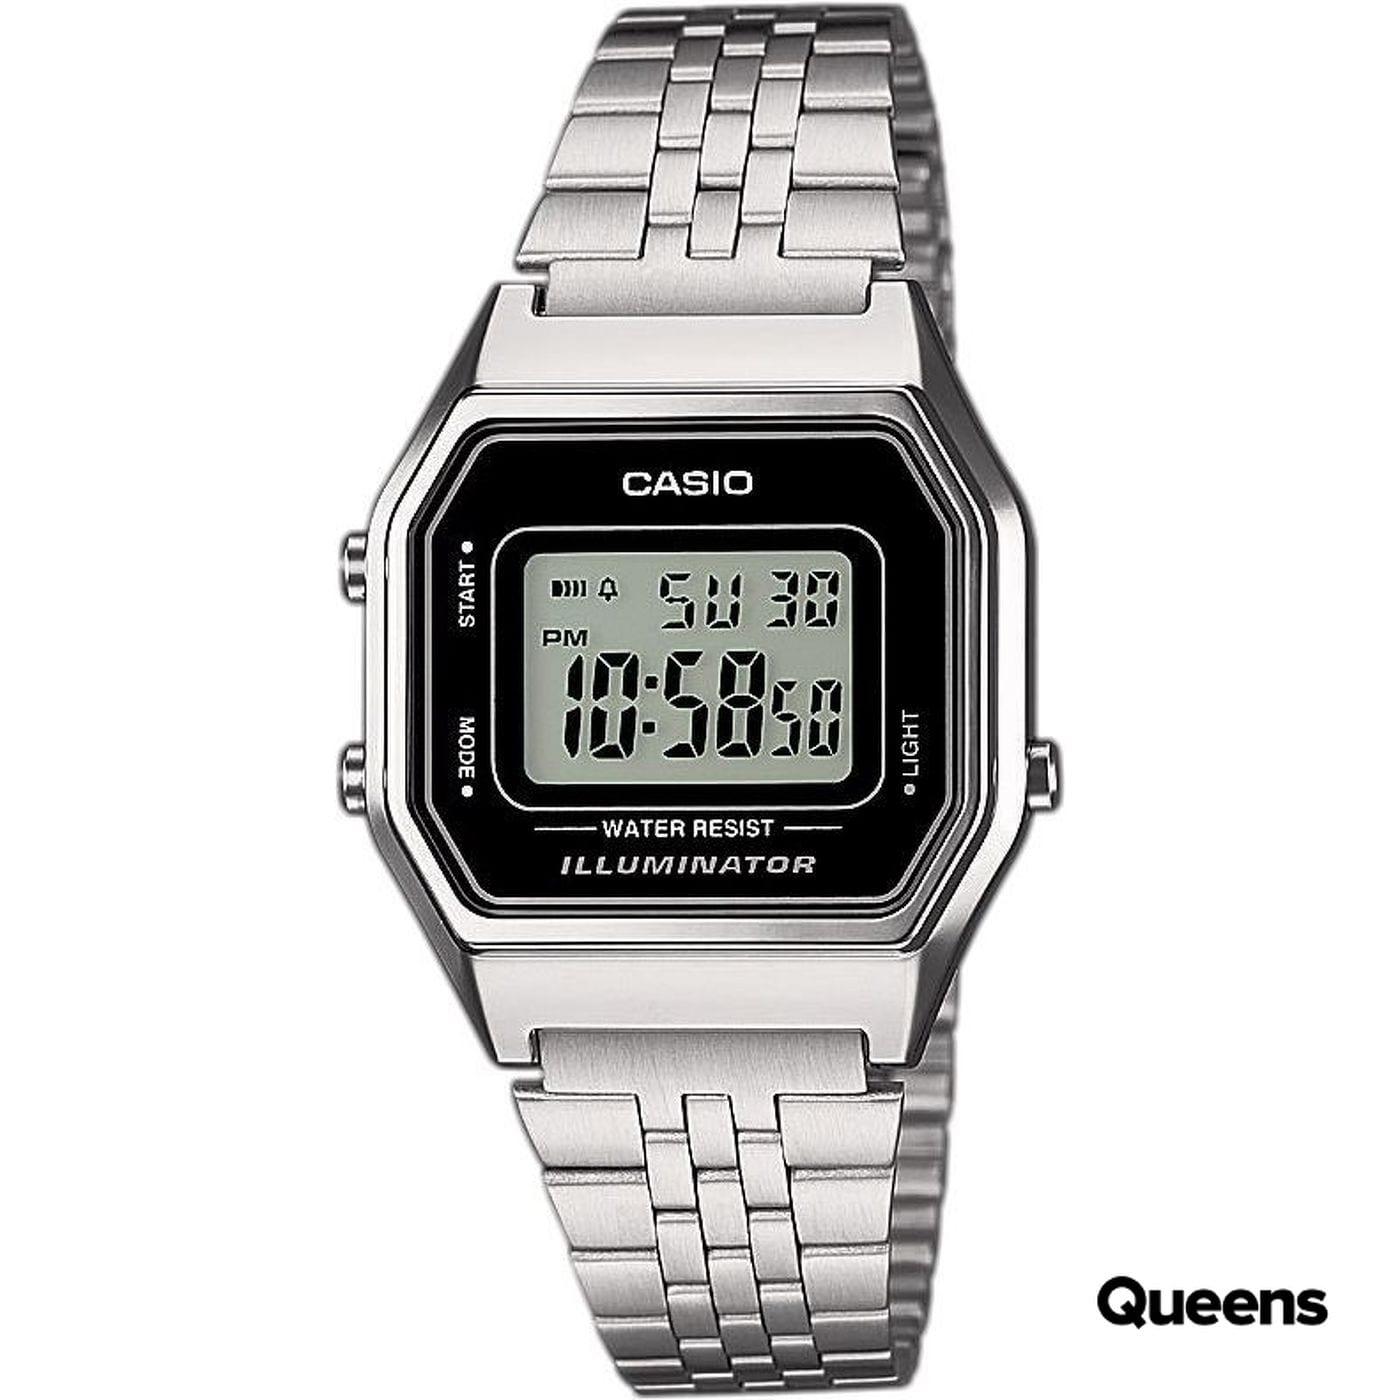 Casio LA680WEA-1BEF silver